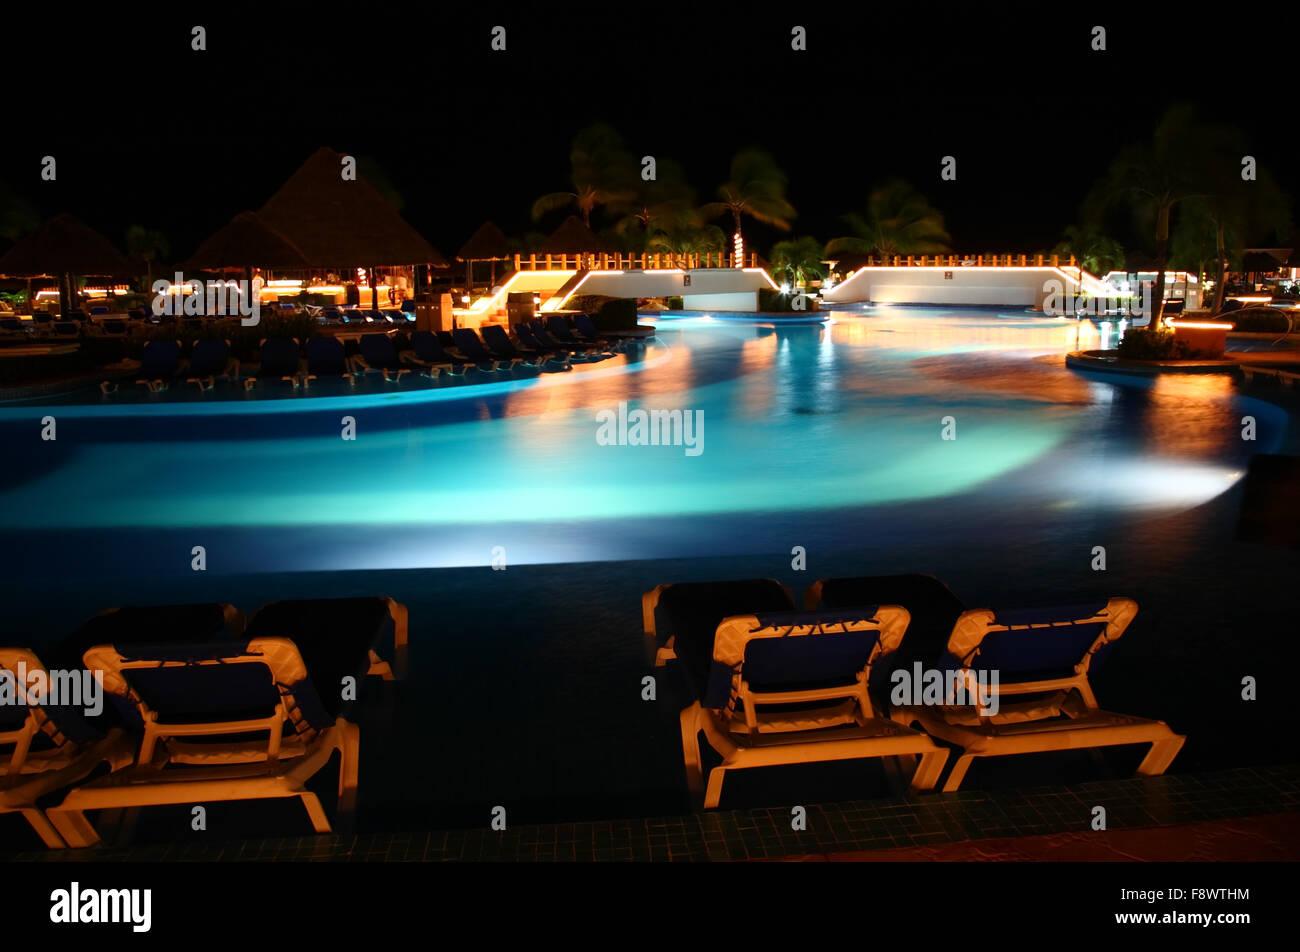 Tropical Resort Night Vacation Stock Photos Tropical